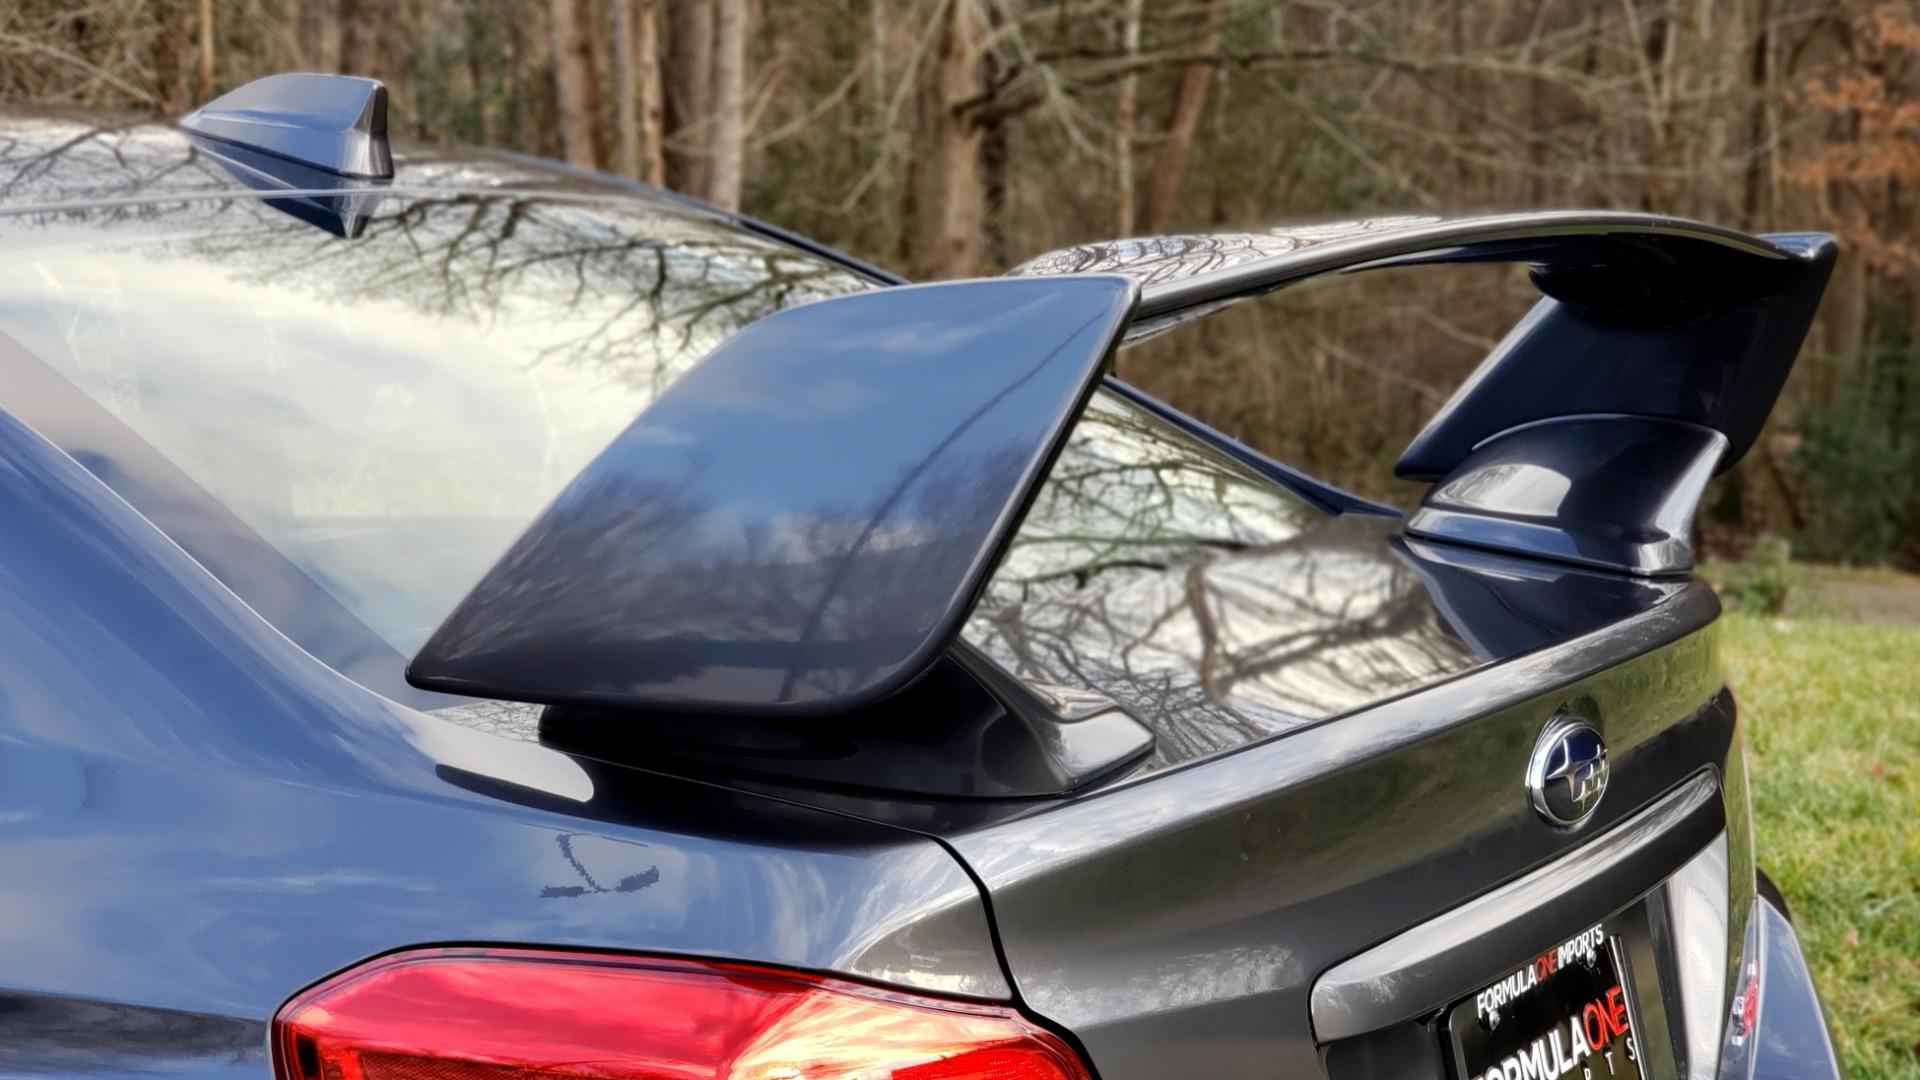 Used 2020 Subaru WRX STI 2.5L TURBO / 6-SPEED MANUAL / RECARO SEATS / REARVIEW for sale Sold at Formula Imports in Charlotte NC 28227 10